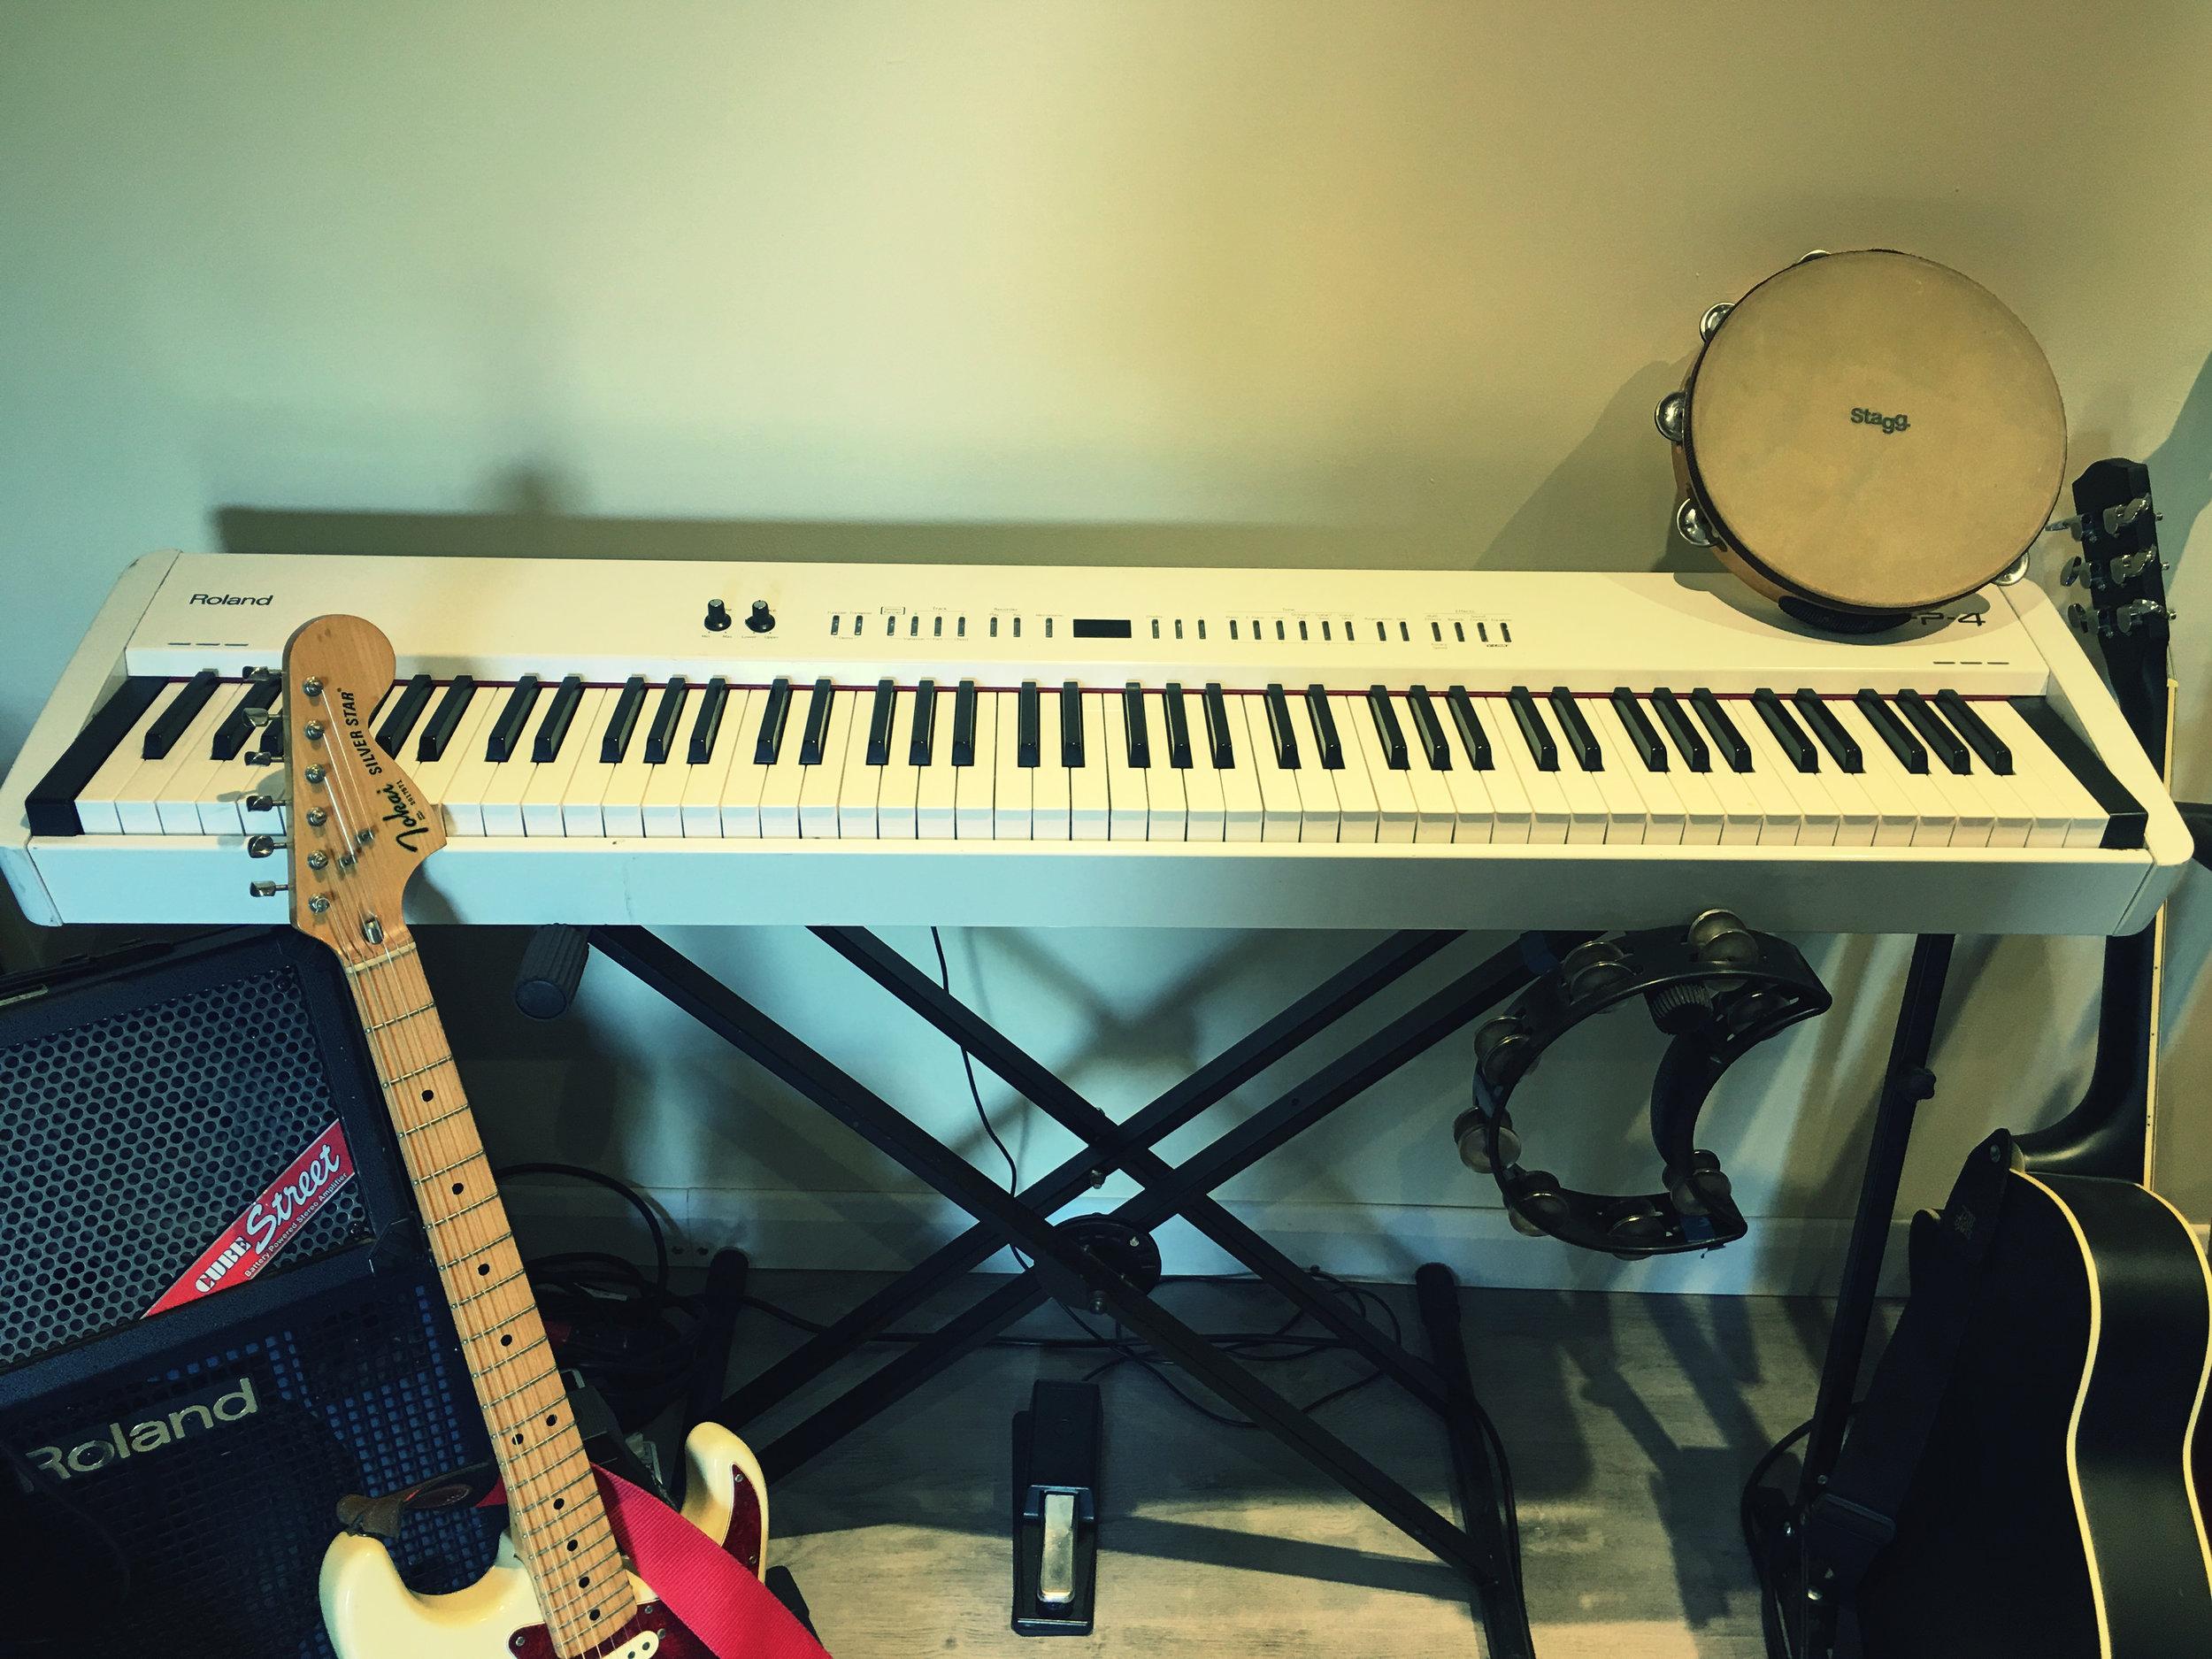 Studio 8 - roland piano.jpeg